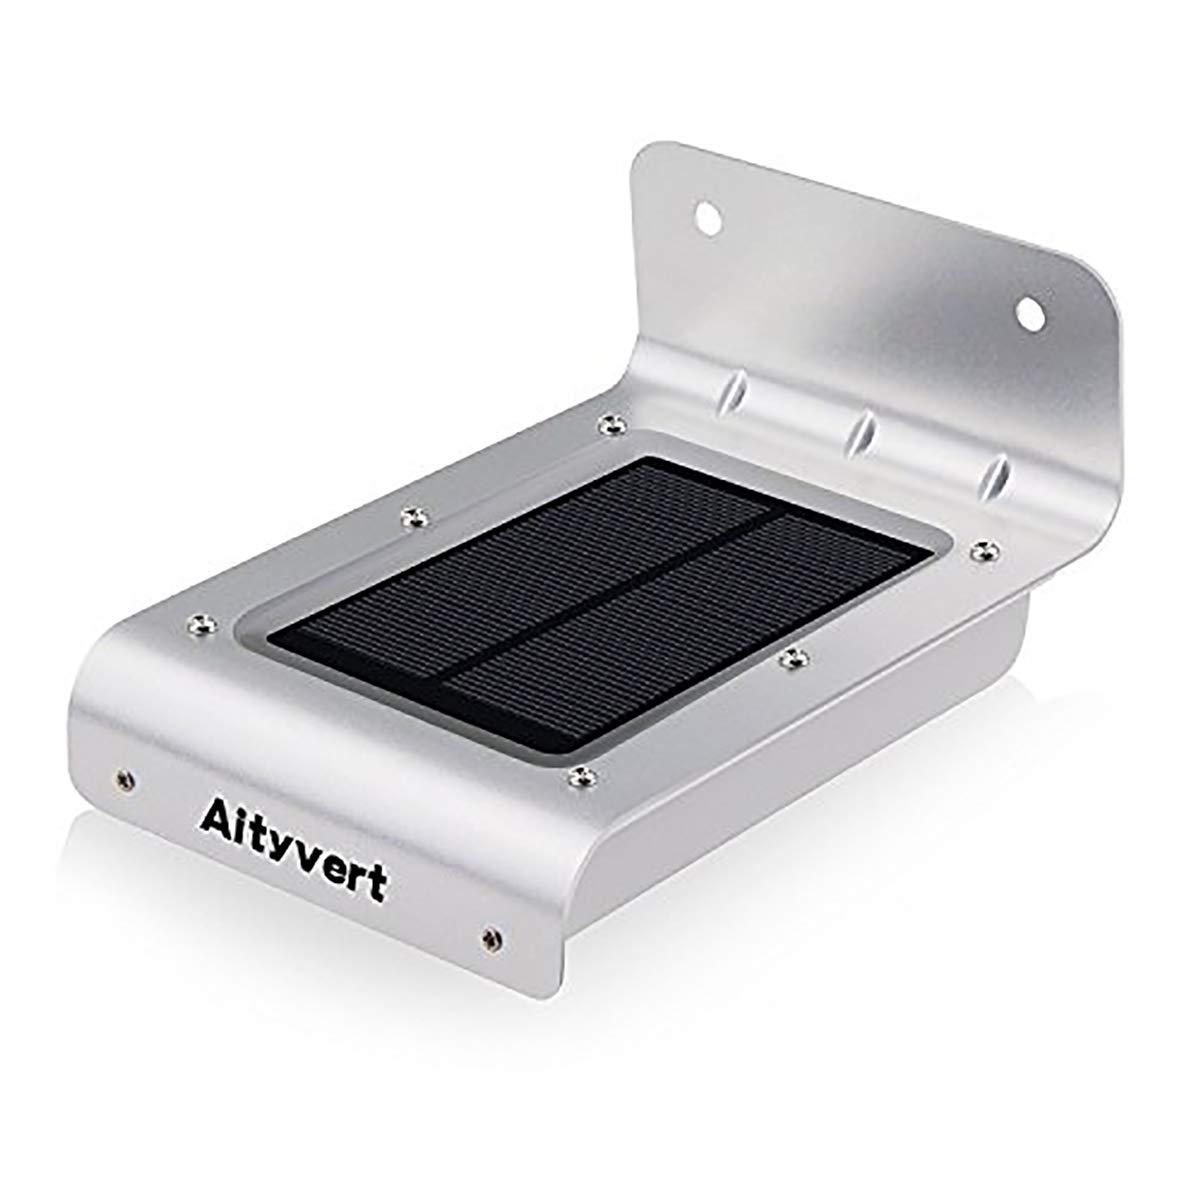 Aityvert Solar Motion Sensor Light 16 LEDS Super Bright Outdoor Waterproof Wall Light for Garden,Patio,Path Security Lmap Light(1 Pack)